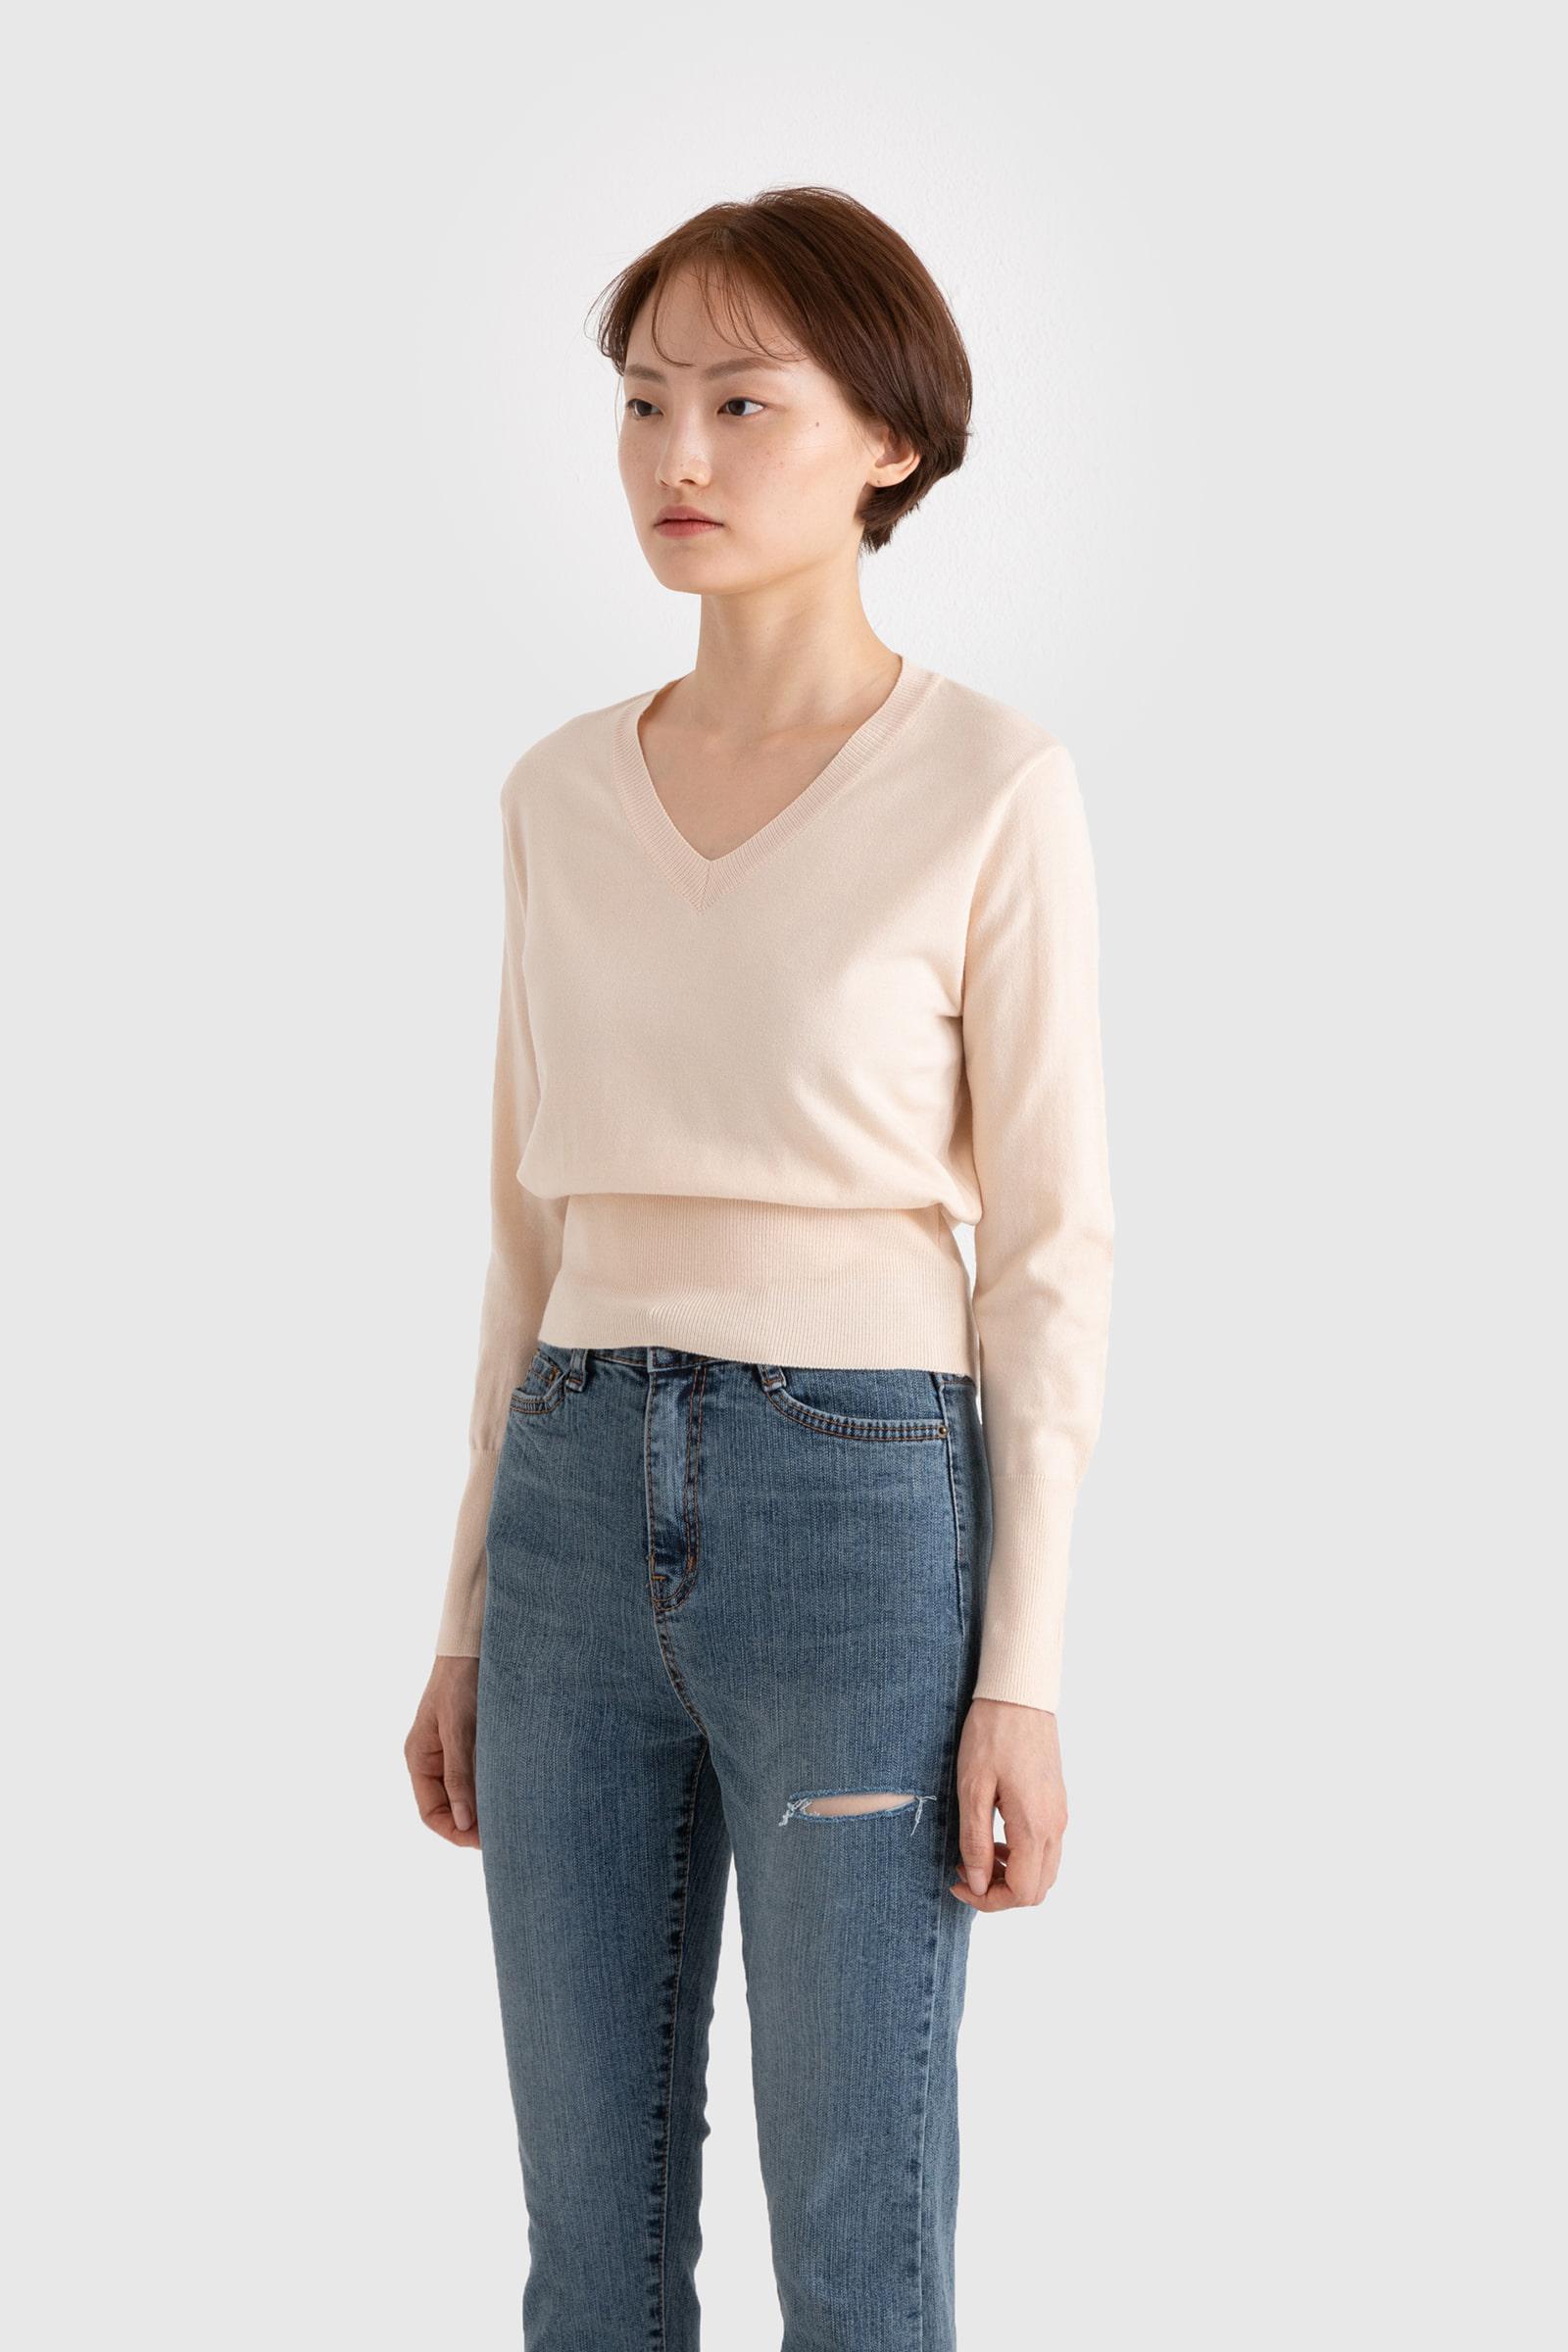 Tension V-neck knit